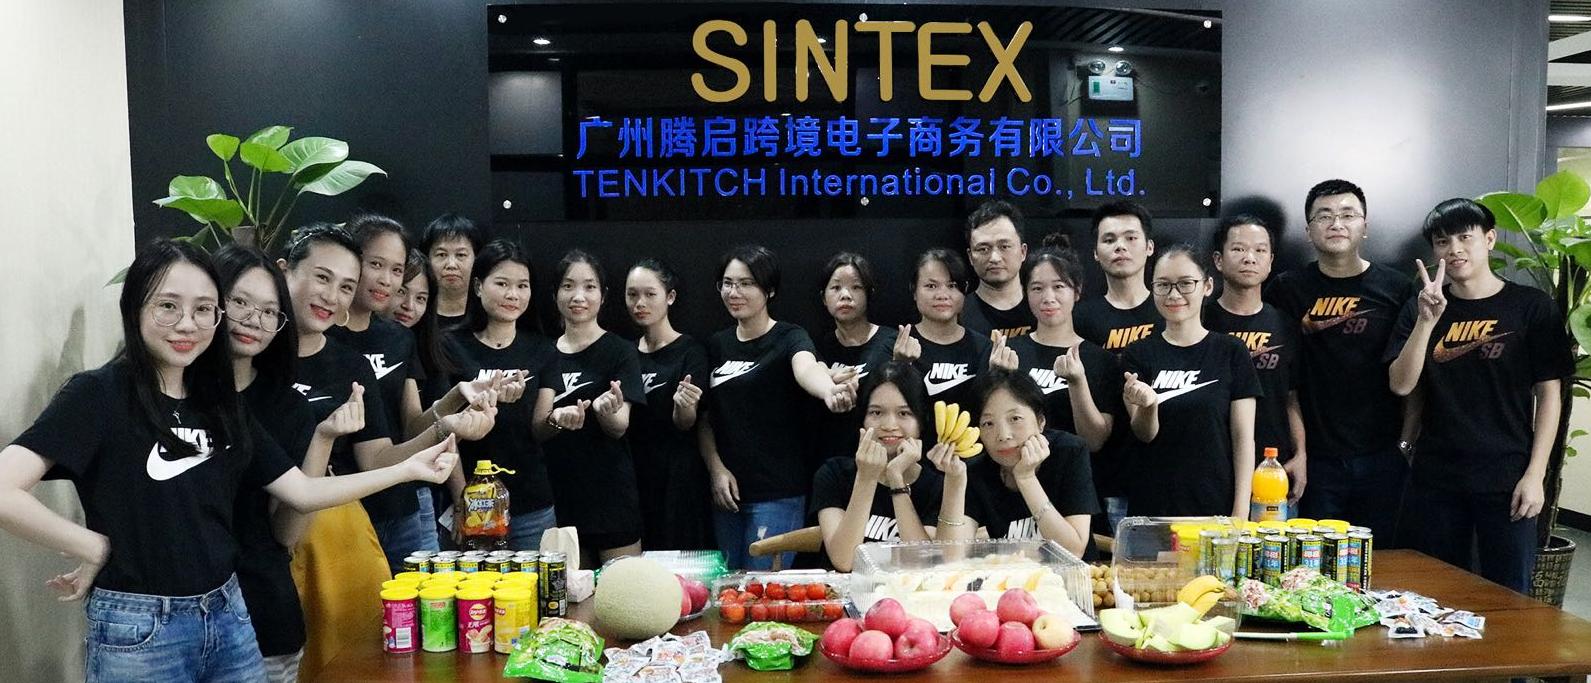 sintex team